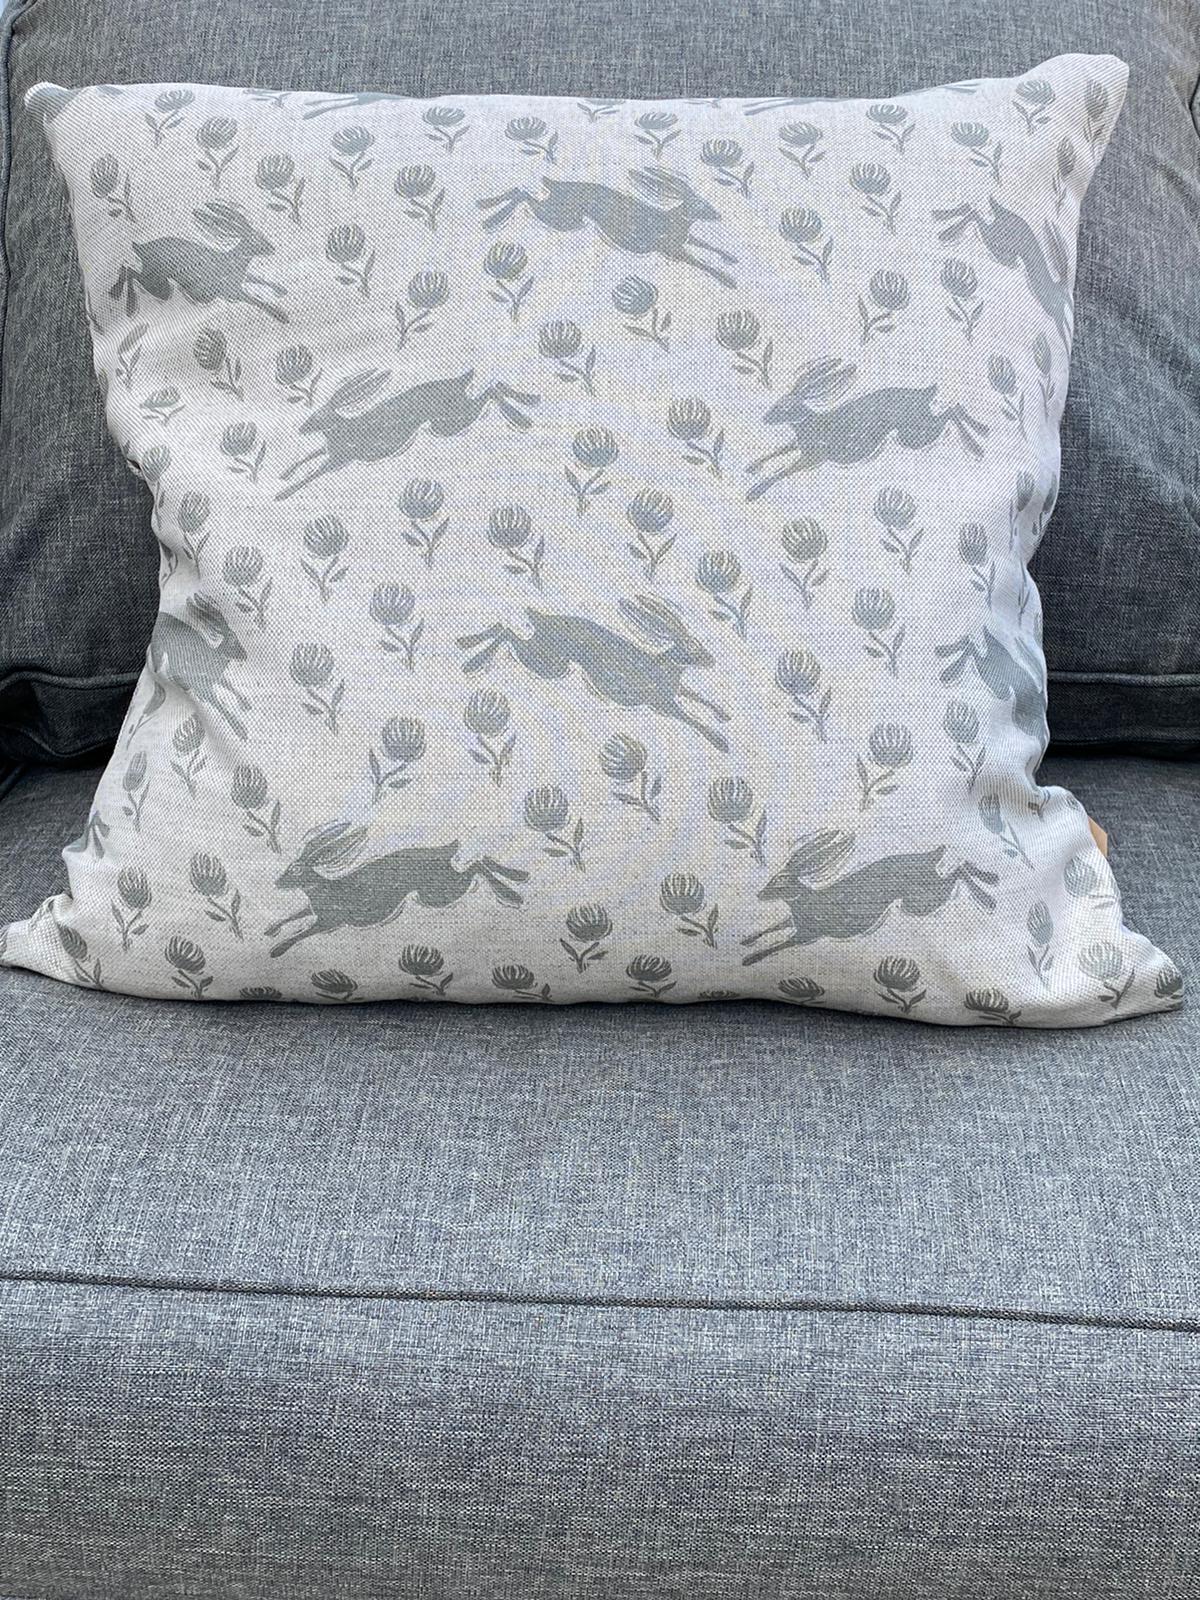 Sam Wilson Feather Cushions - Running Grey Hare